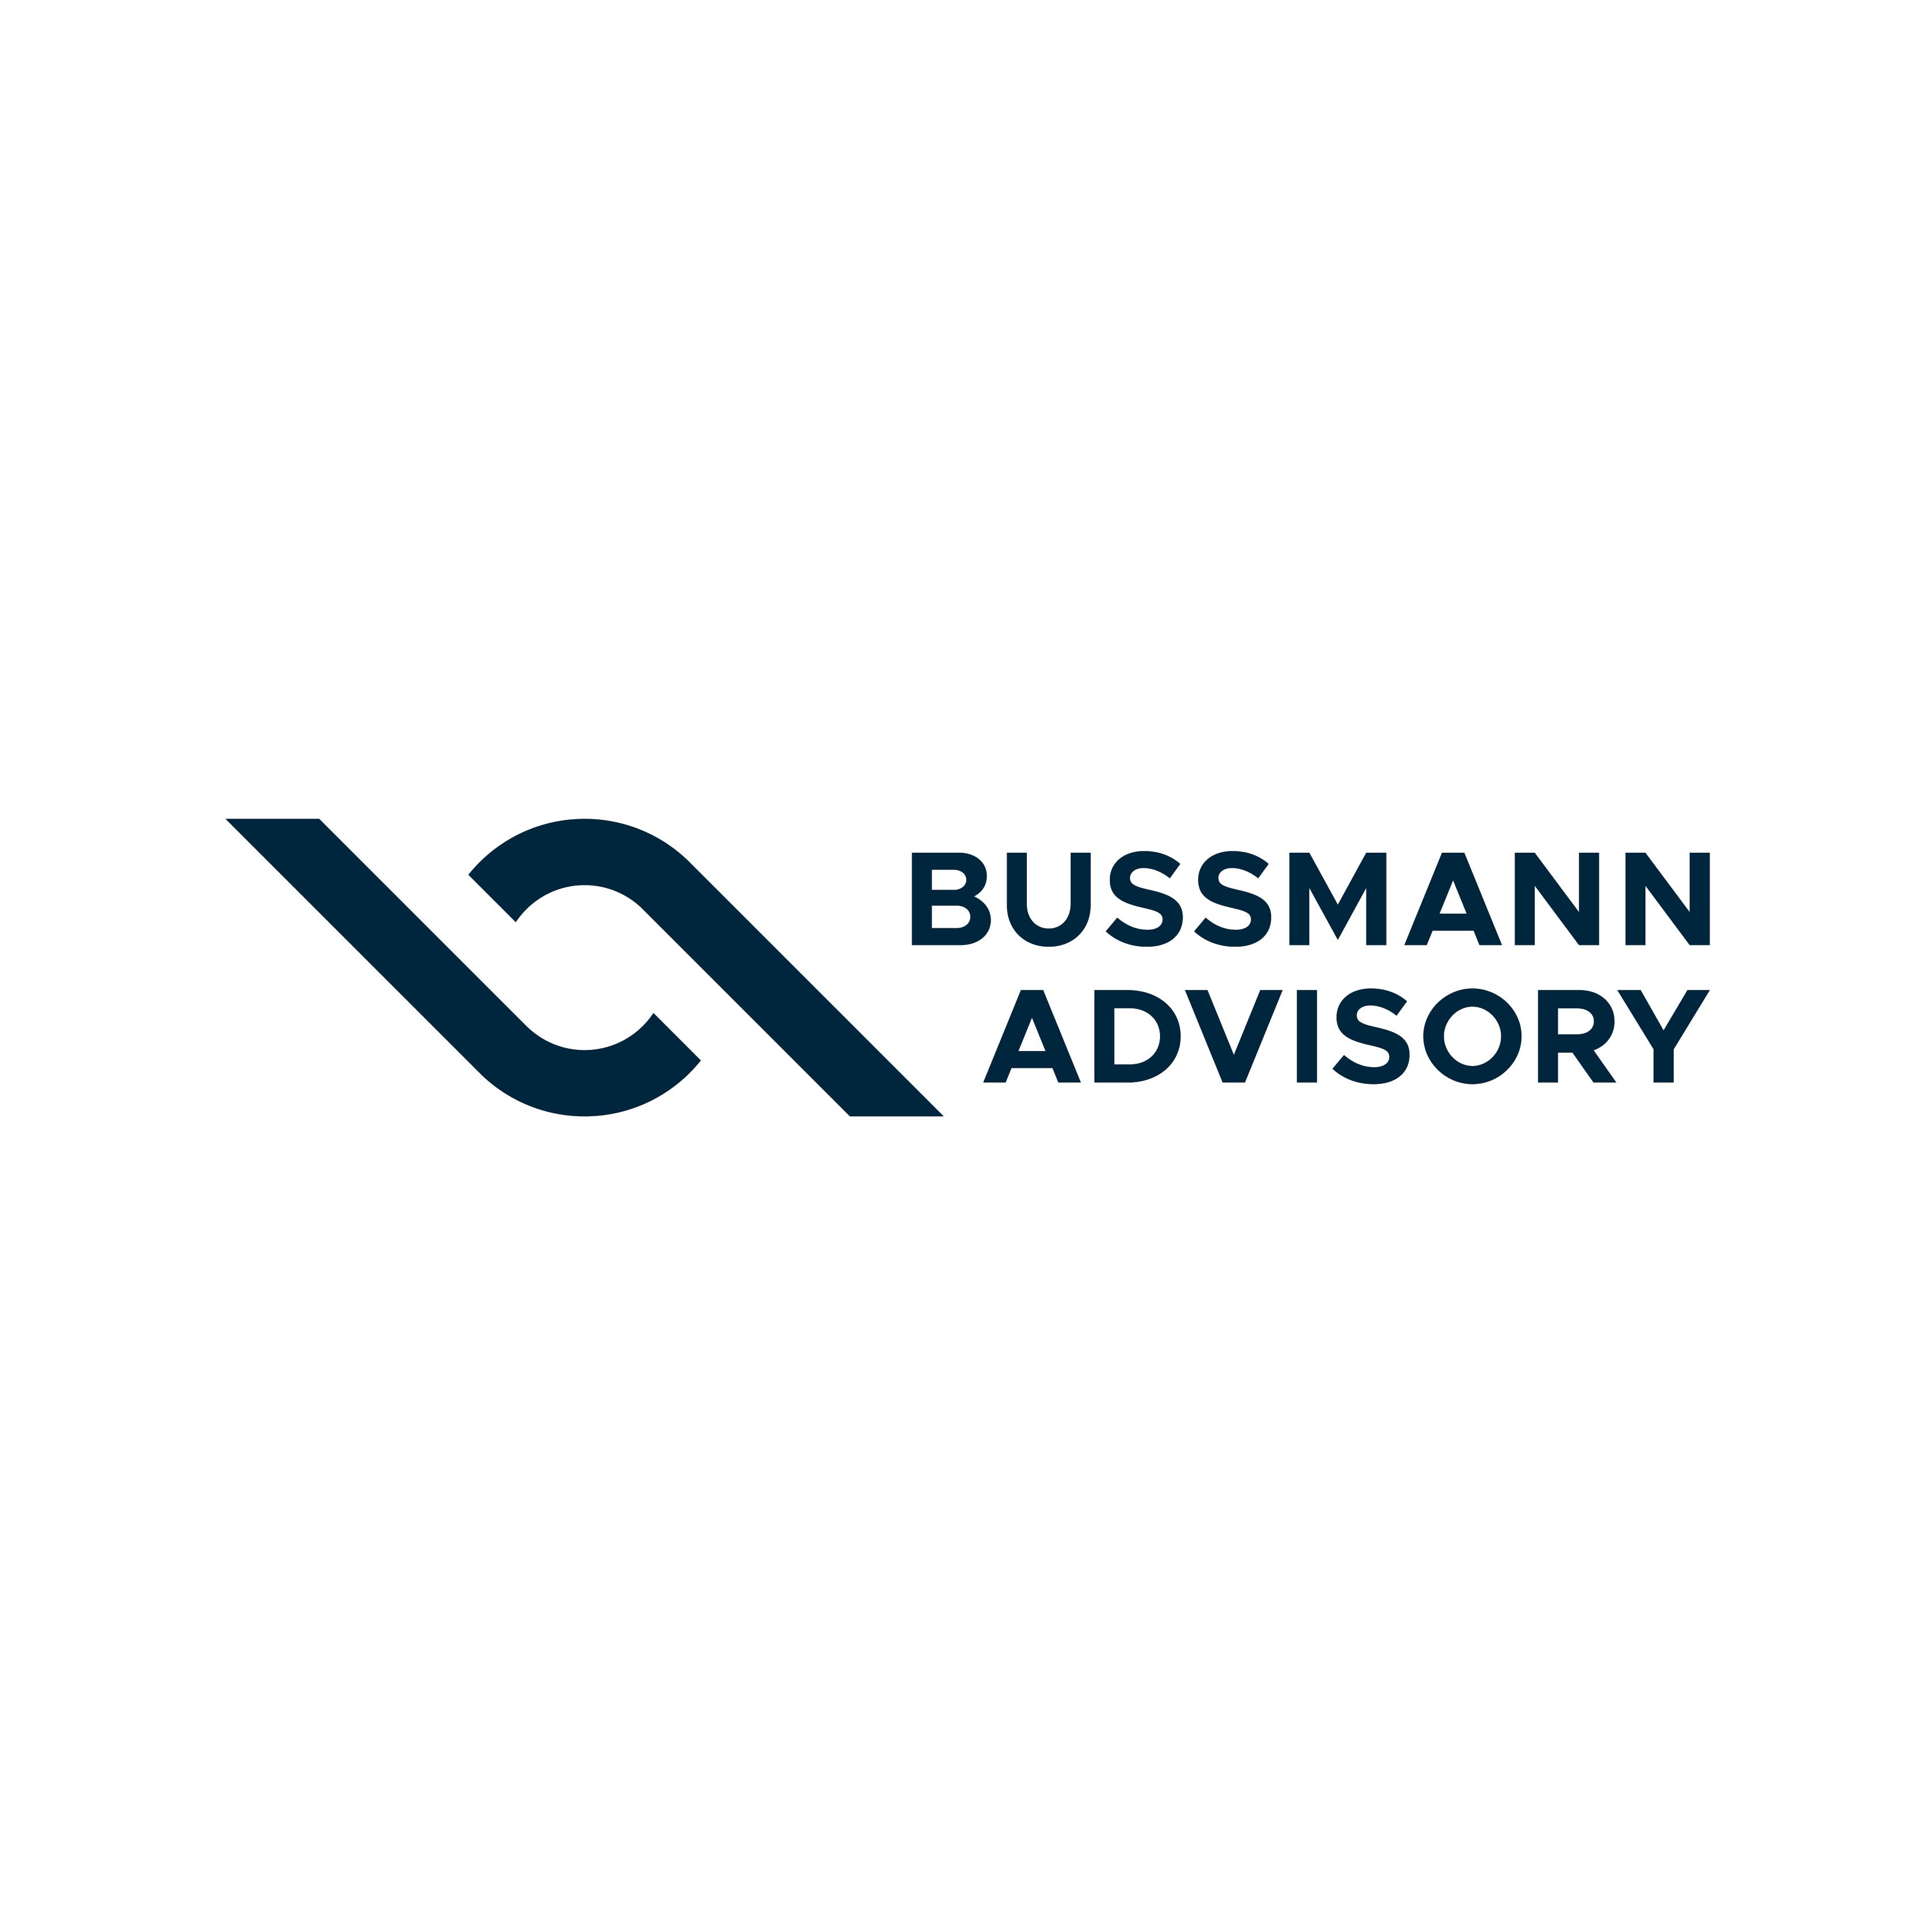 Bussmann Advisory logo